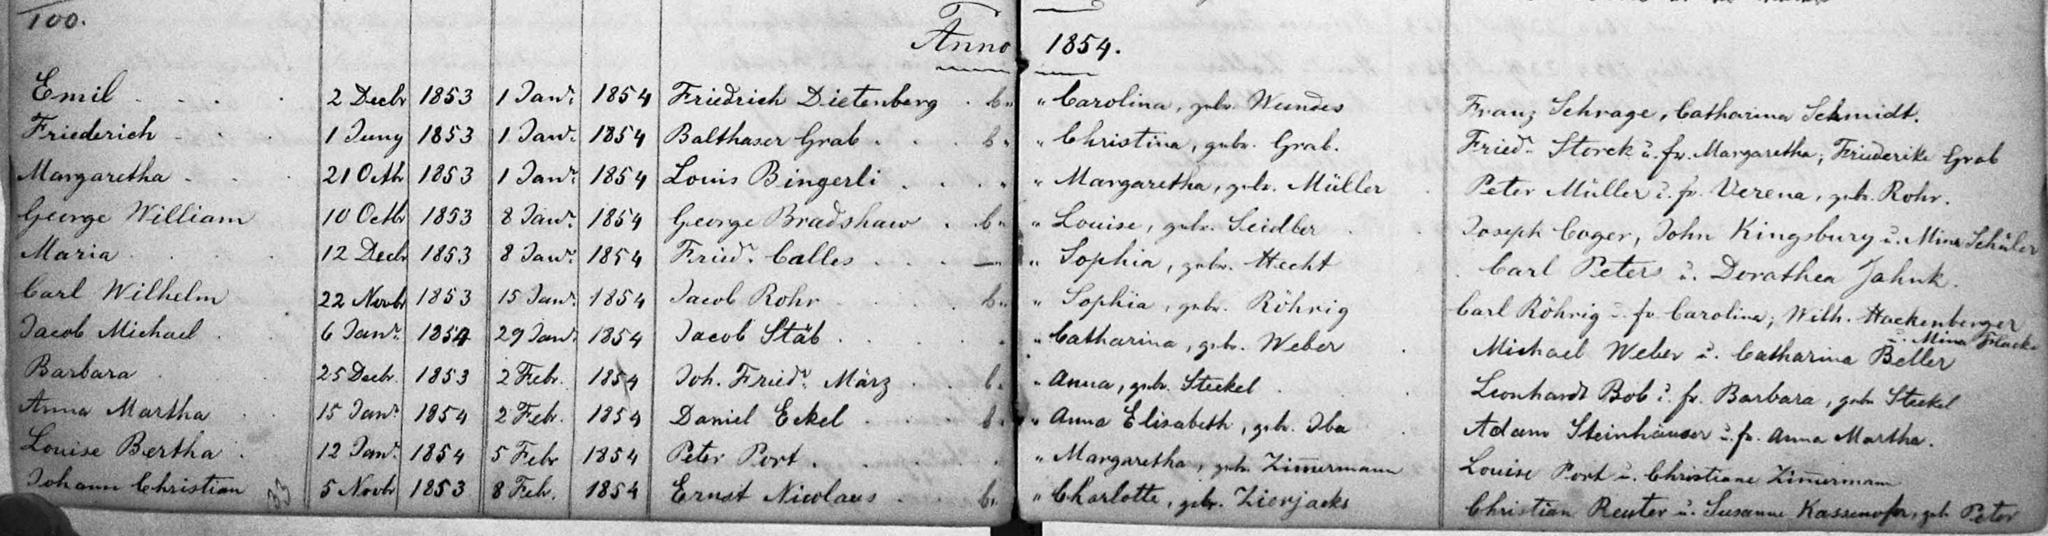 Birth of Johann Christian Nicholas (later Charles Nicklos)